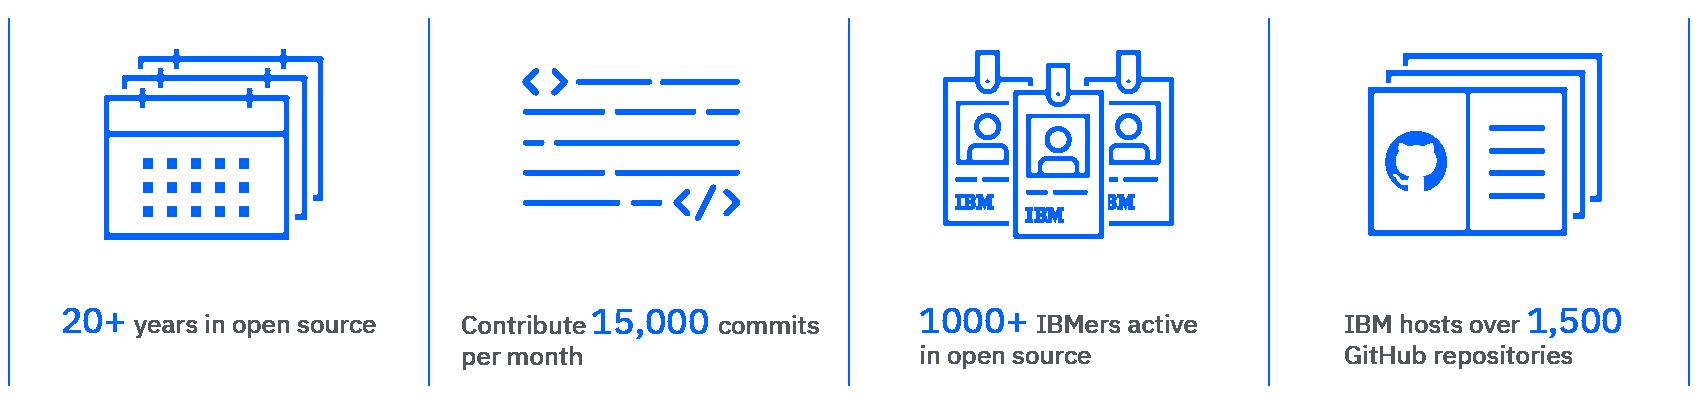 IBM がオープンソースに価値を置く理由の画像